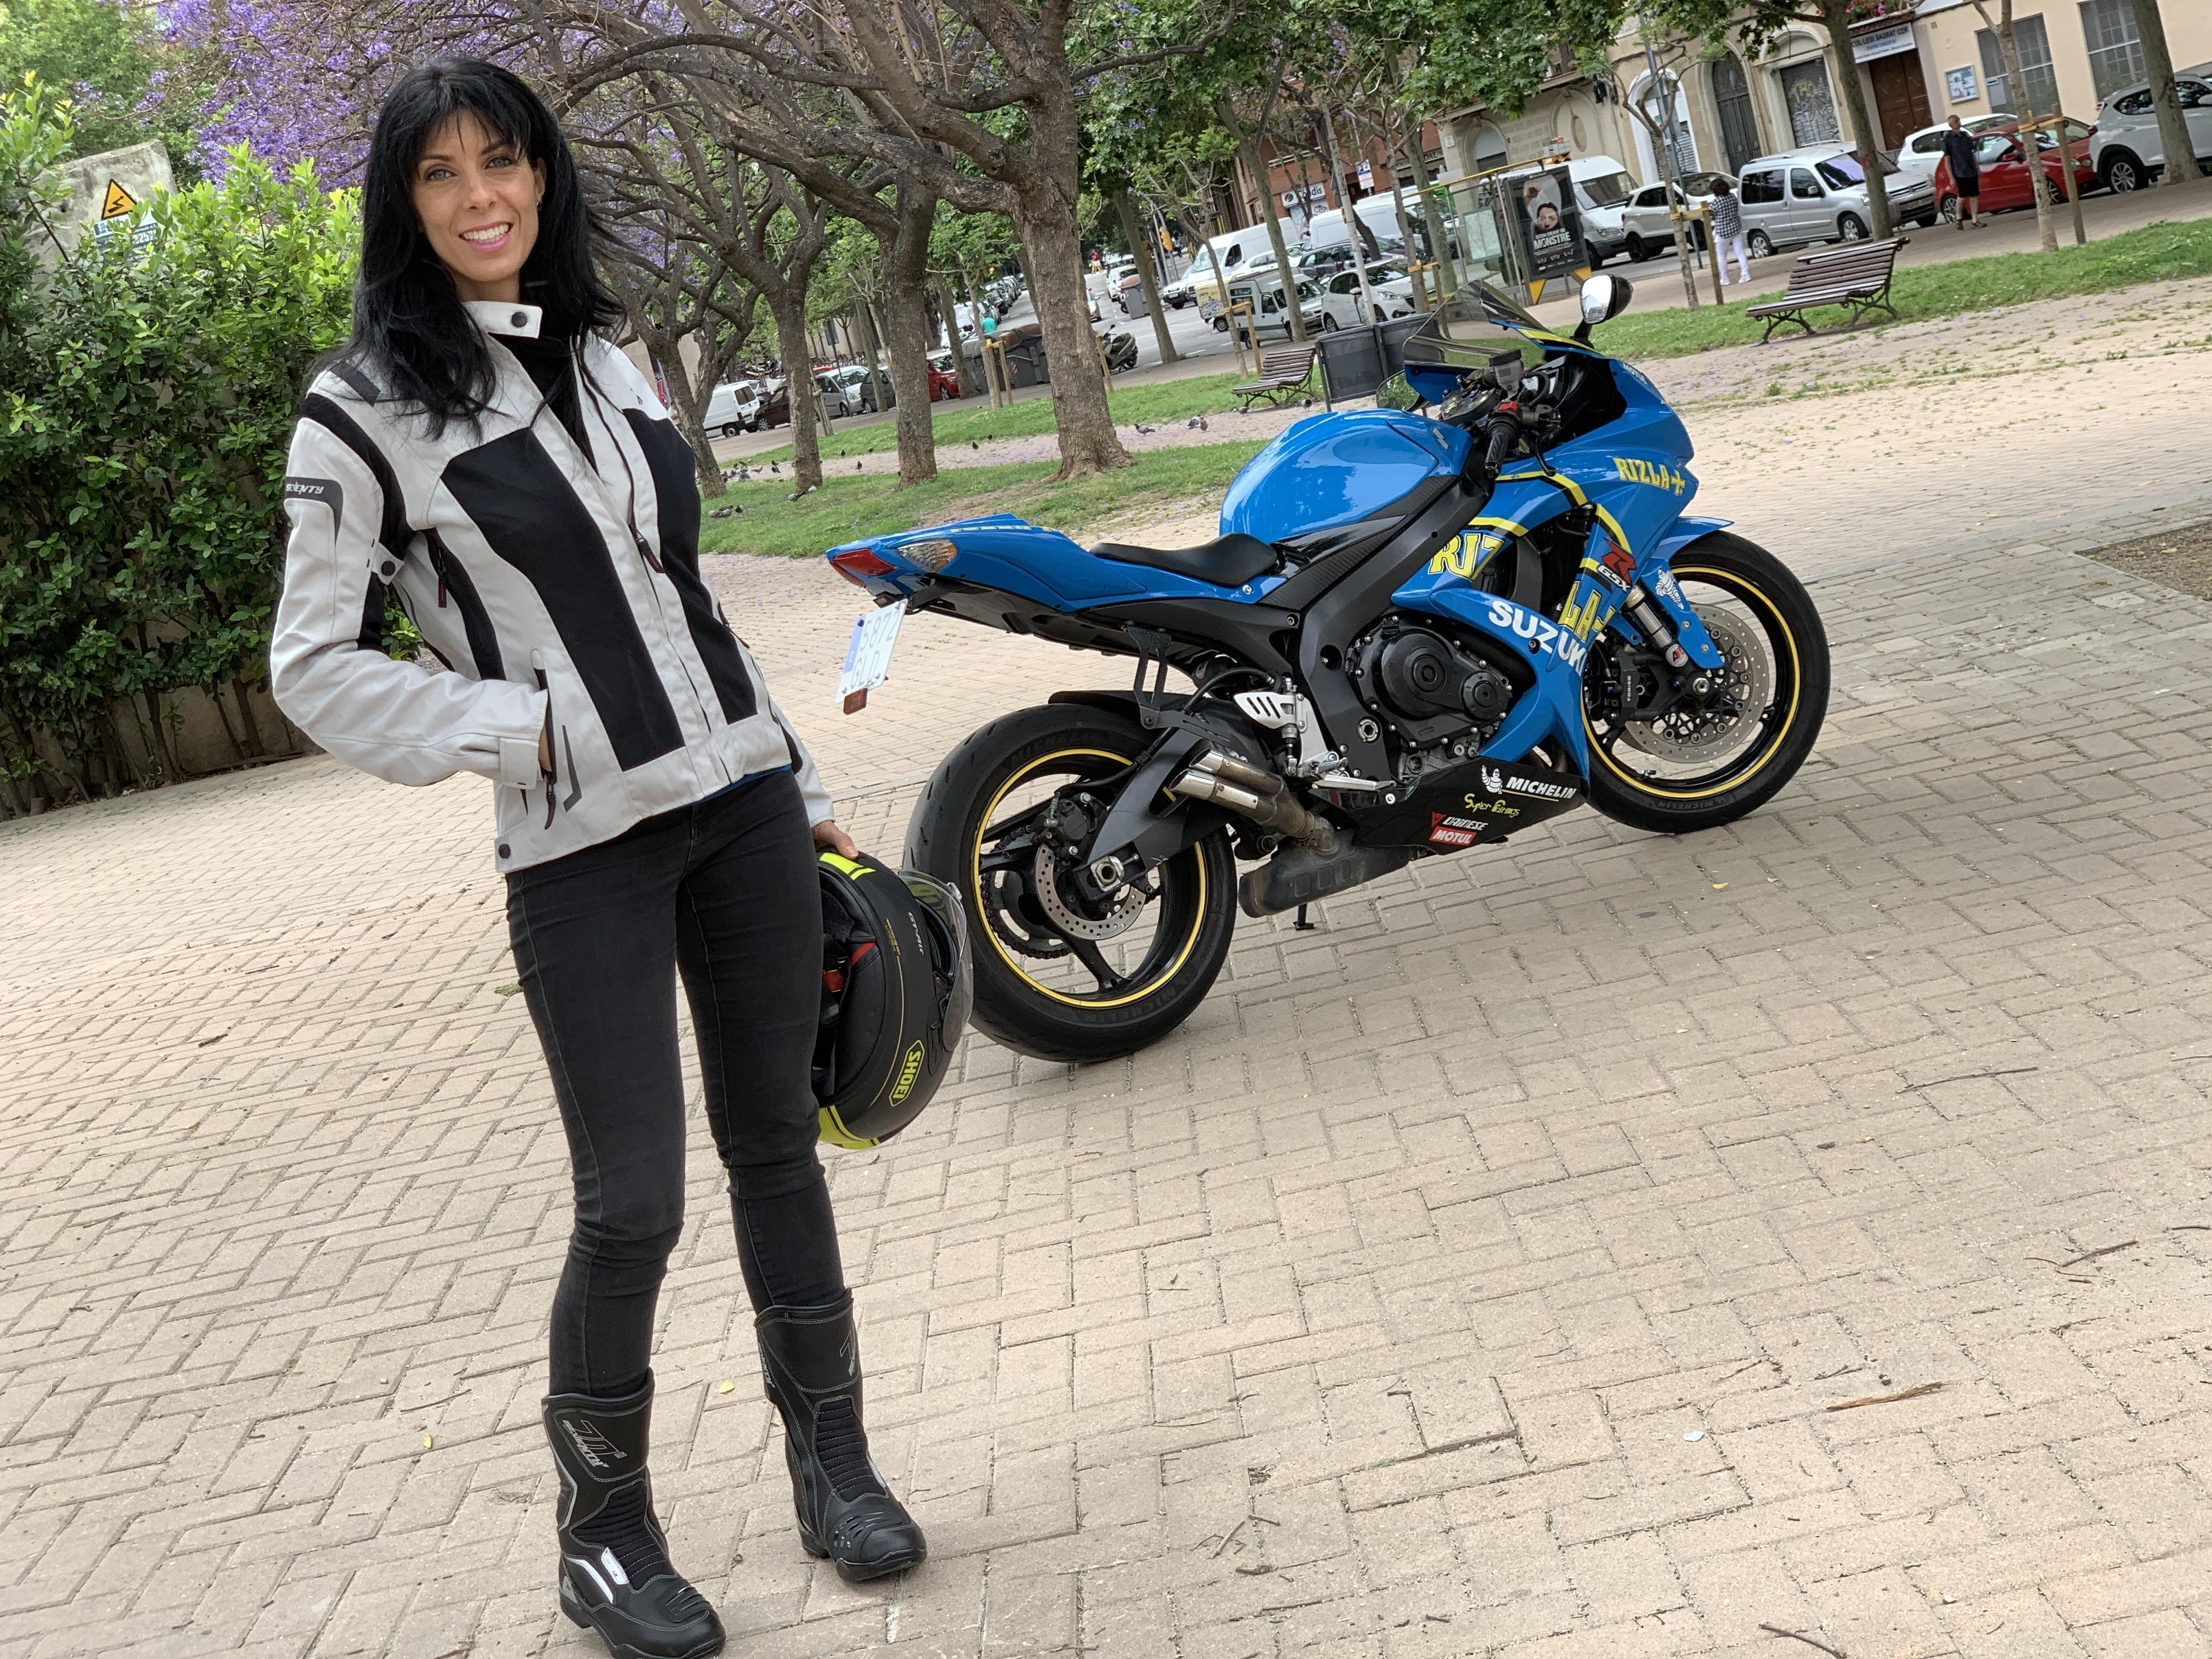 chaqueta de moto mujer, chaqueta cordura moto, seventy degrees, outfit verano, ropa de moto de verano, chaqueta moto transpirable